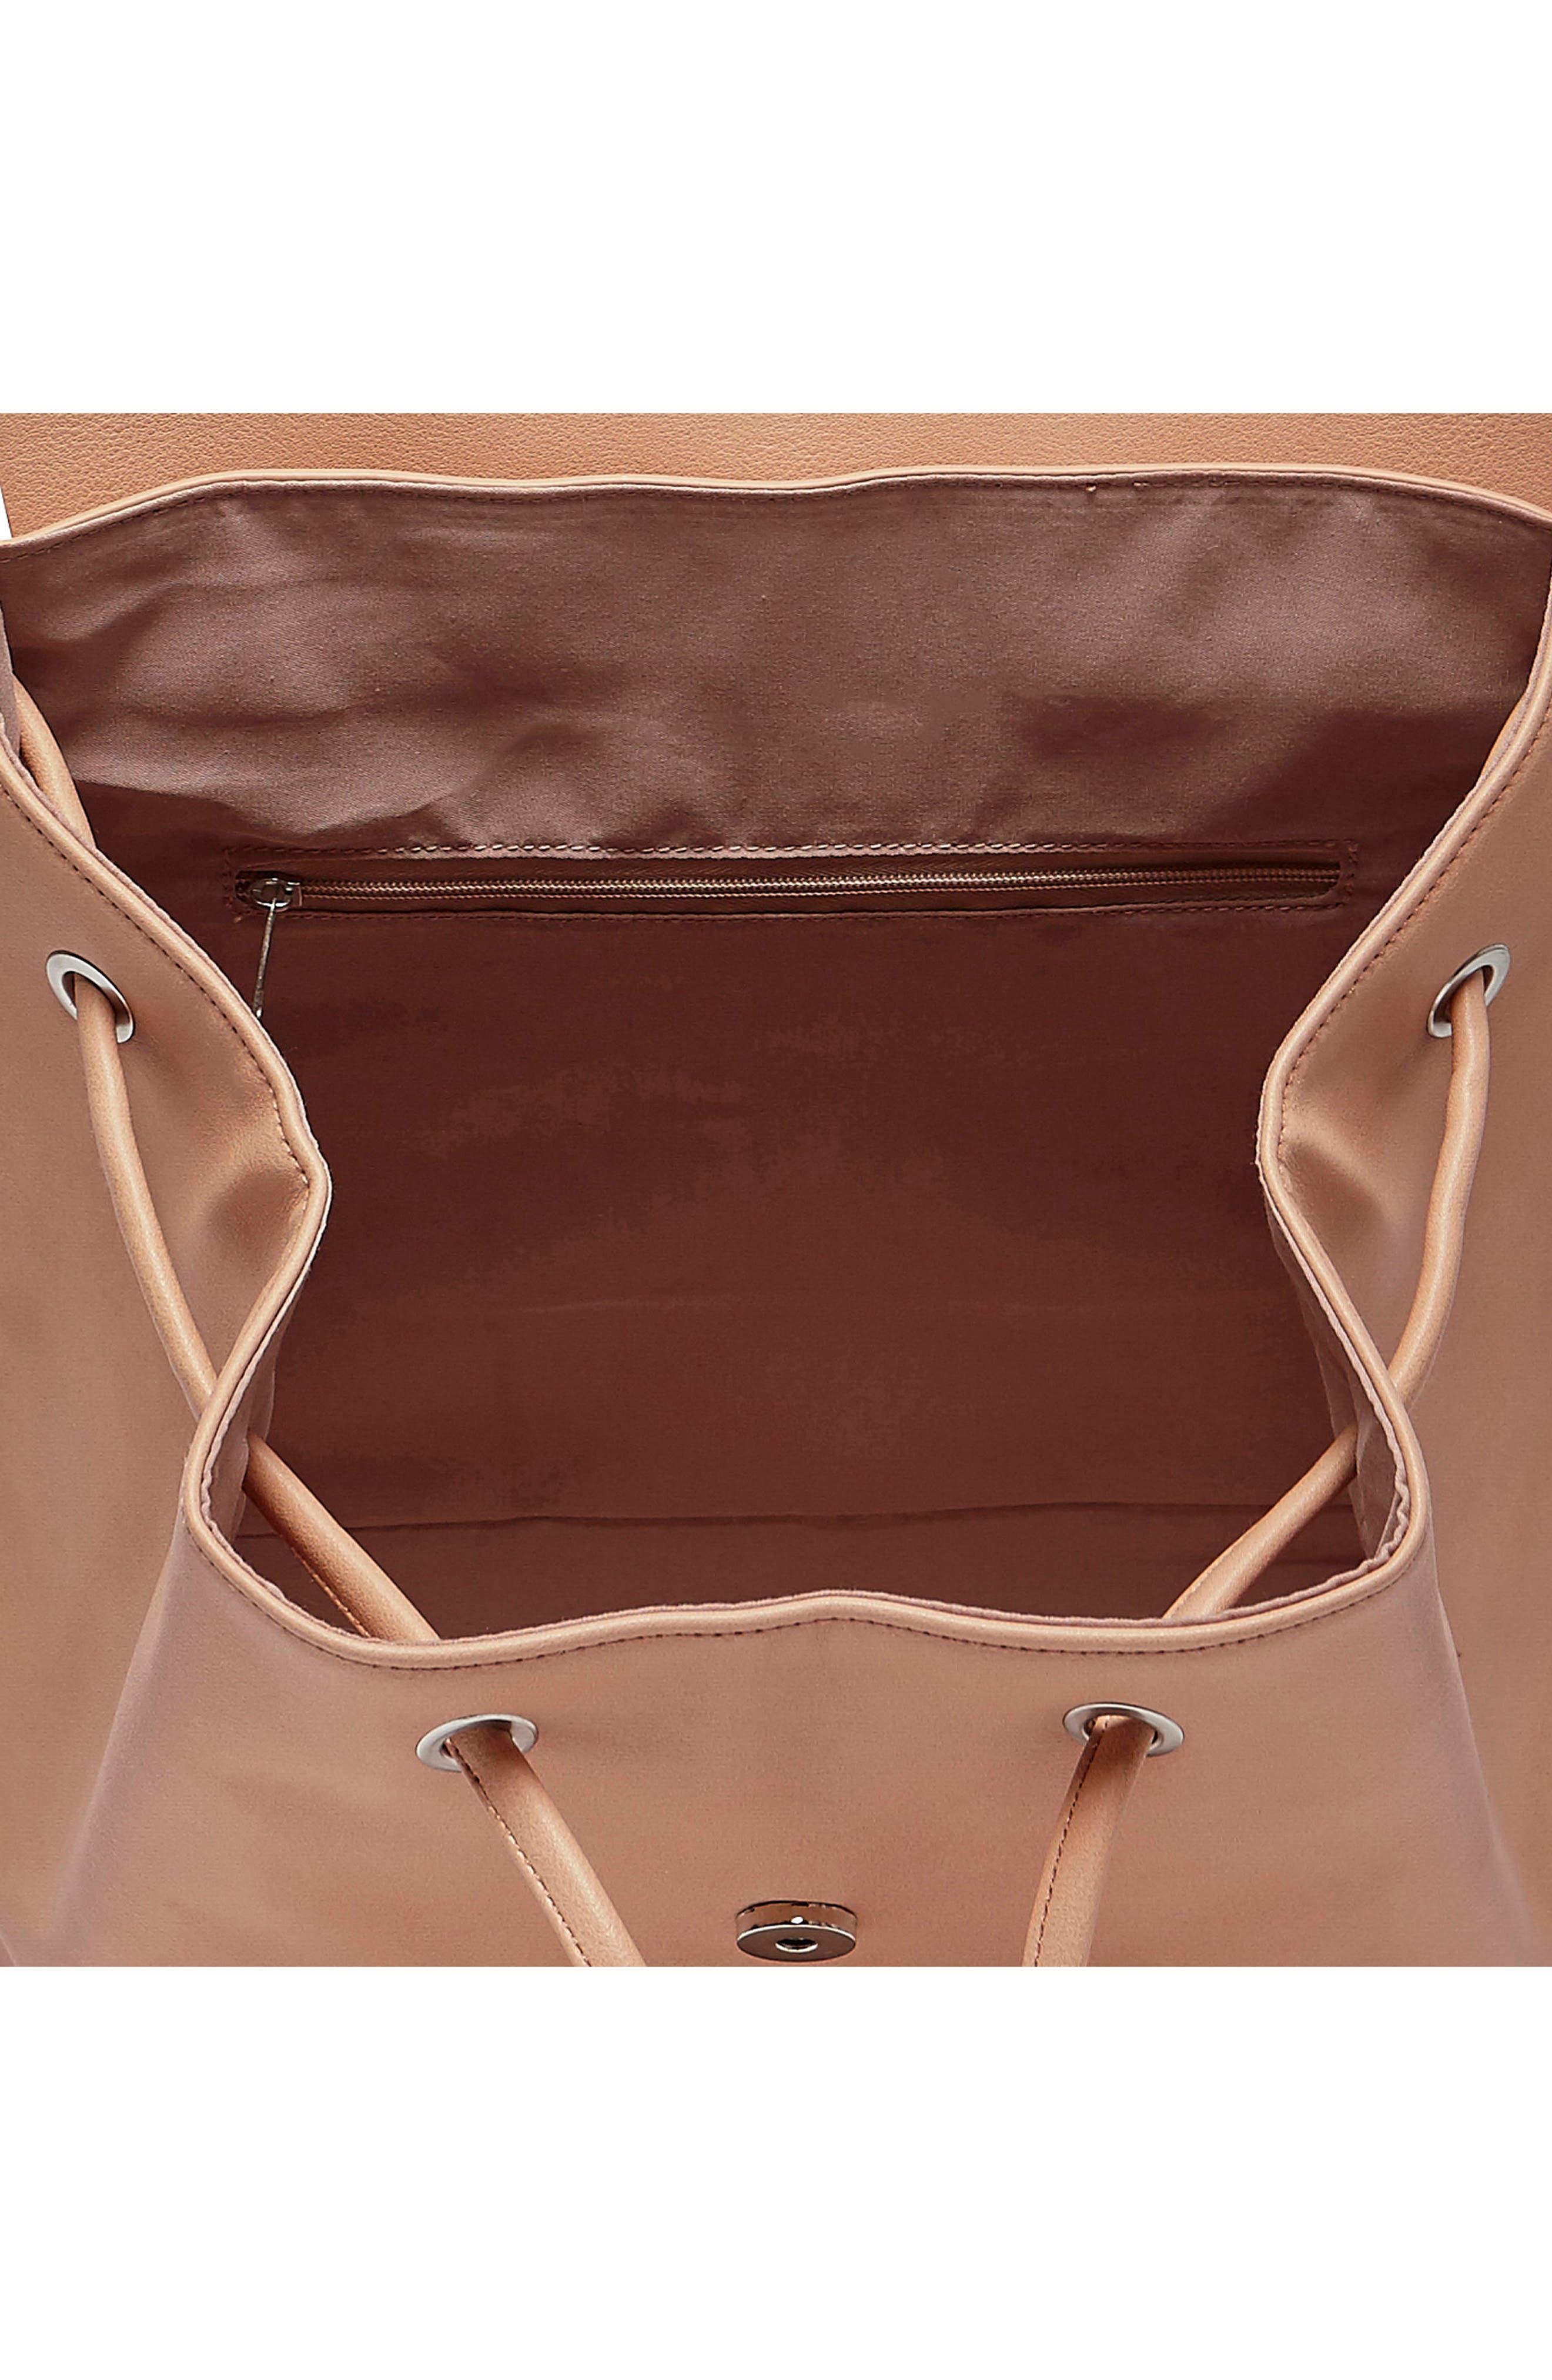 Alternate Image 3  - Urban Originals Midnight Vegan Leather Flap Backpack